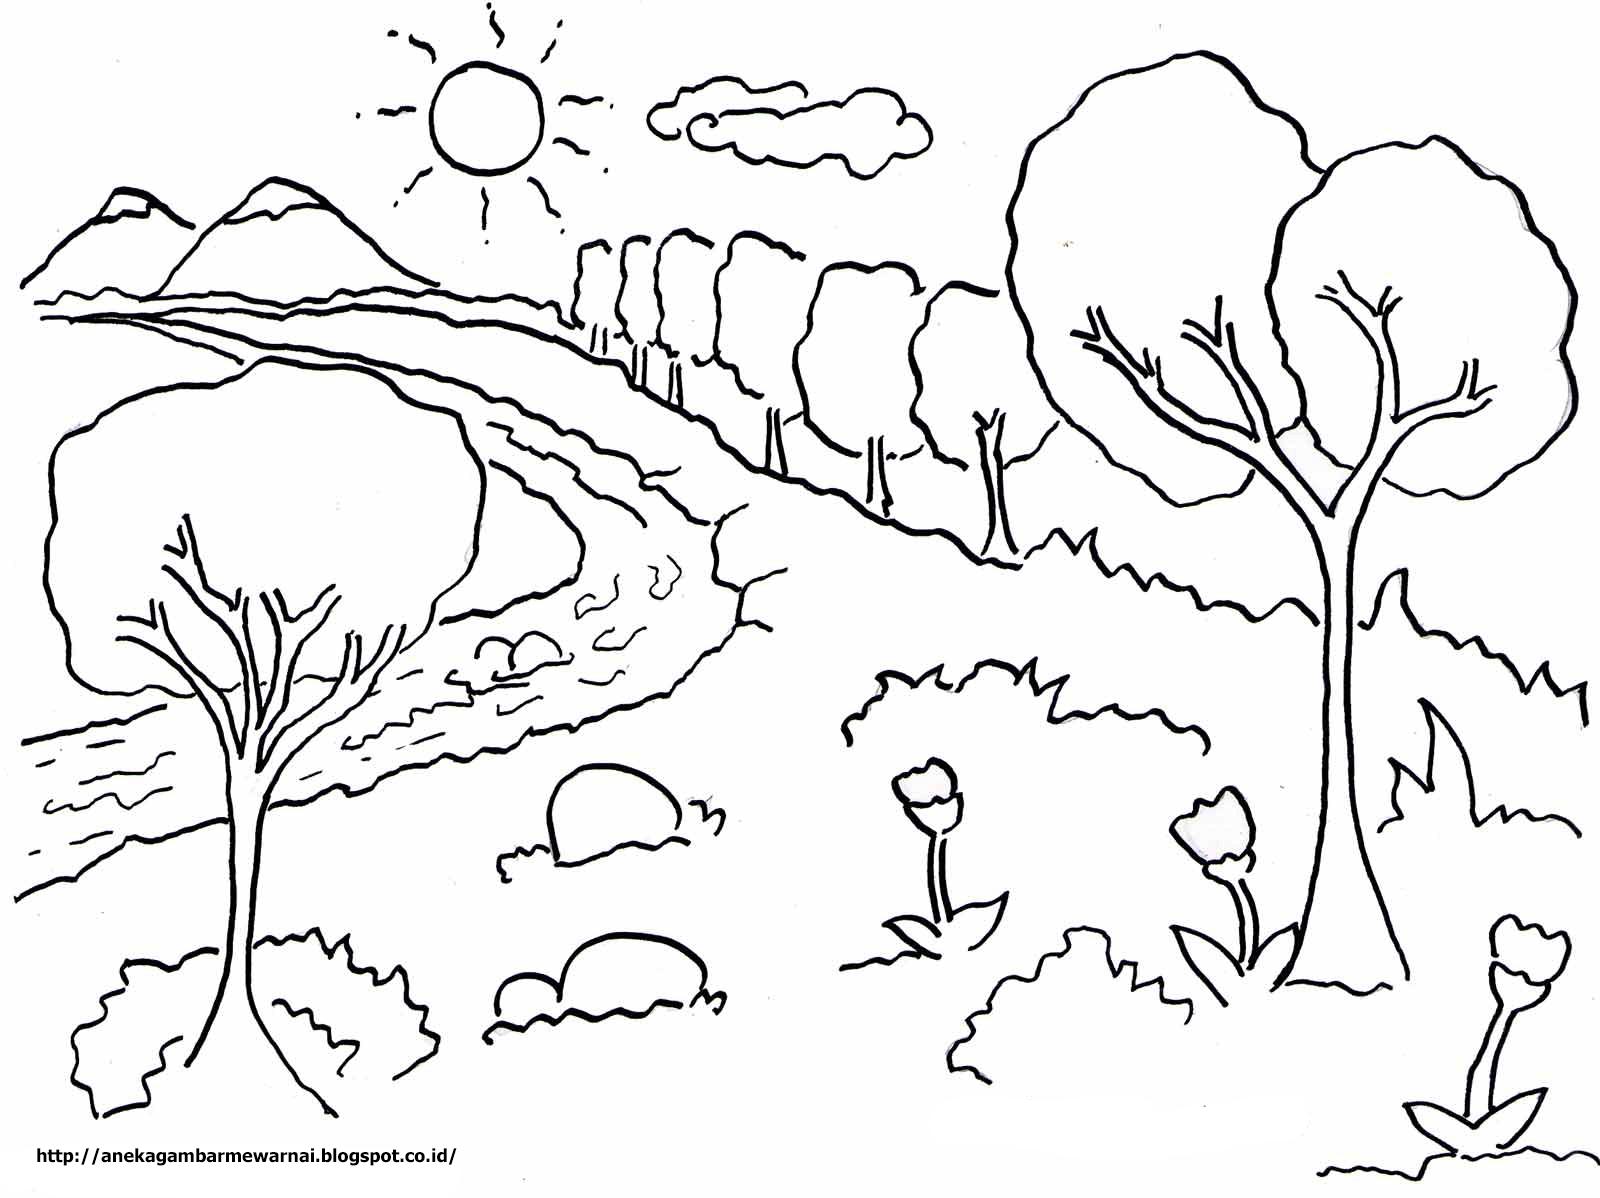 Aneka Gambar Mewarnai Gambar Mewarnai Pemandangan Langit Cerah Untuk Anak Paud Dan Tk